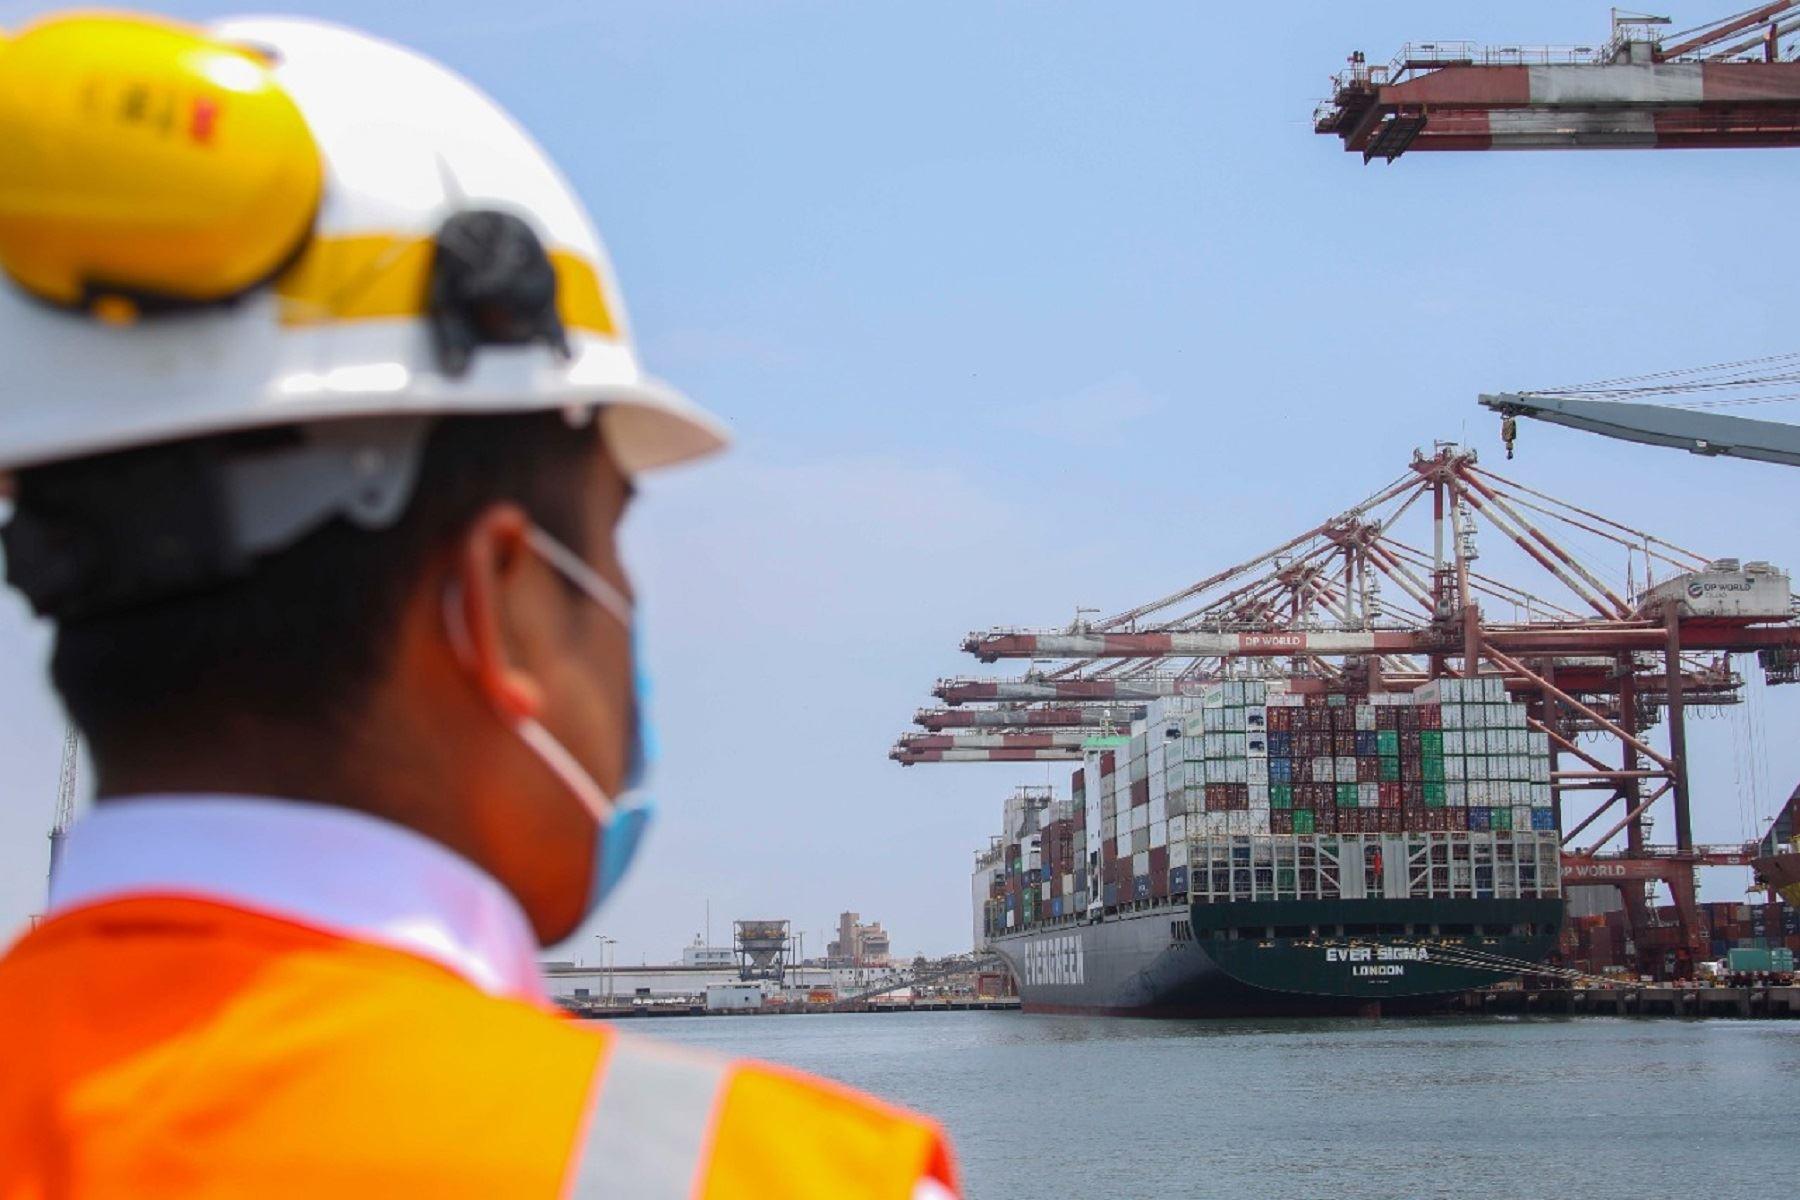 transporte-maritimo-como-enviar-carga-a-traves-del-cabotaje-en-el-peru